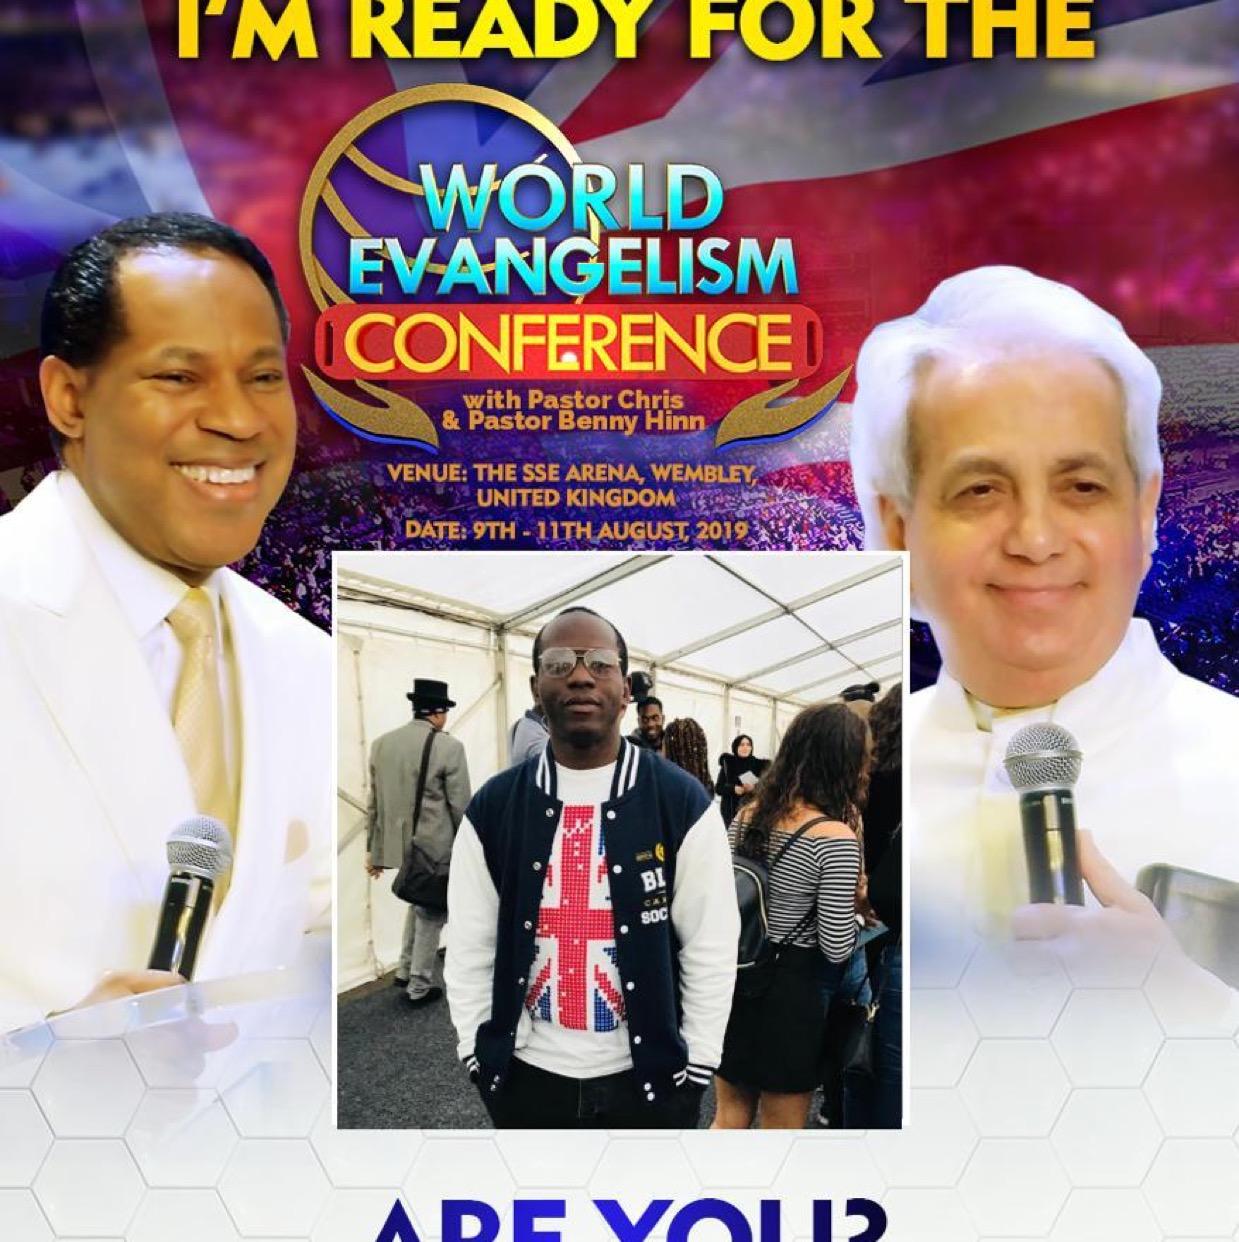 #WECUKwithPastorChris #PastorChris #WEC2019 #Unite